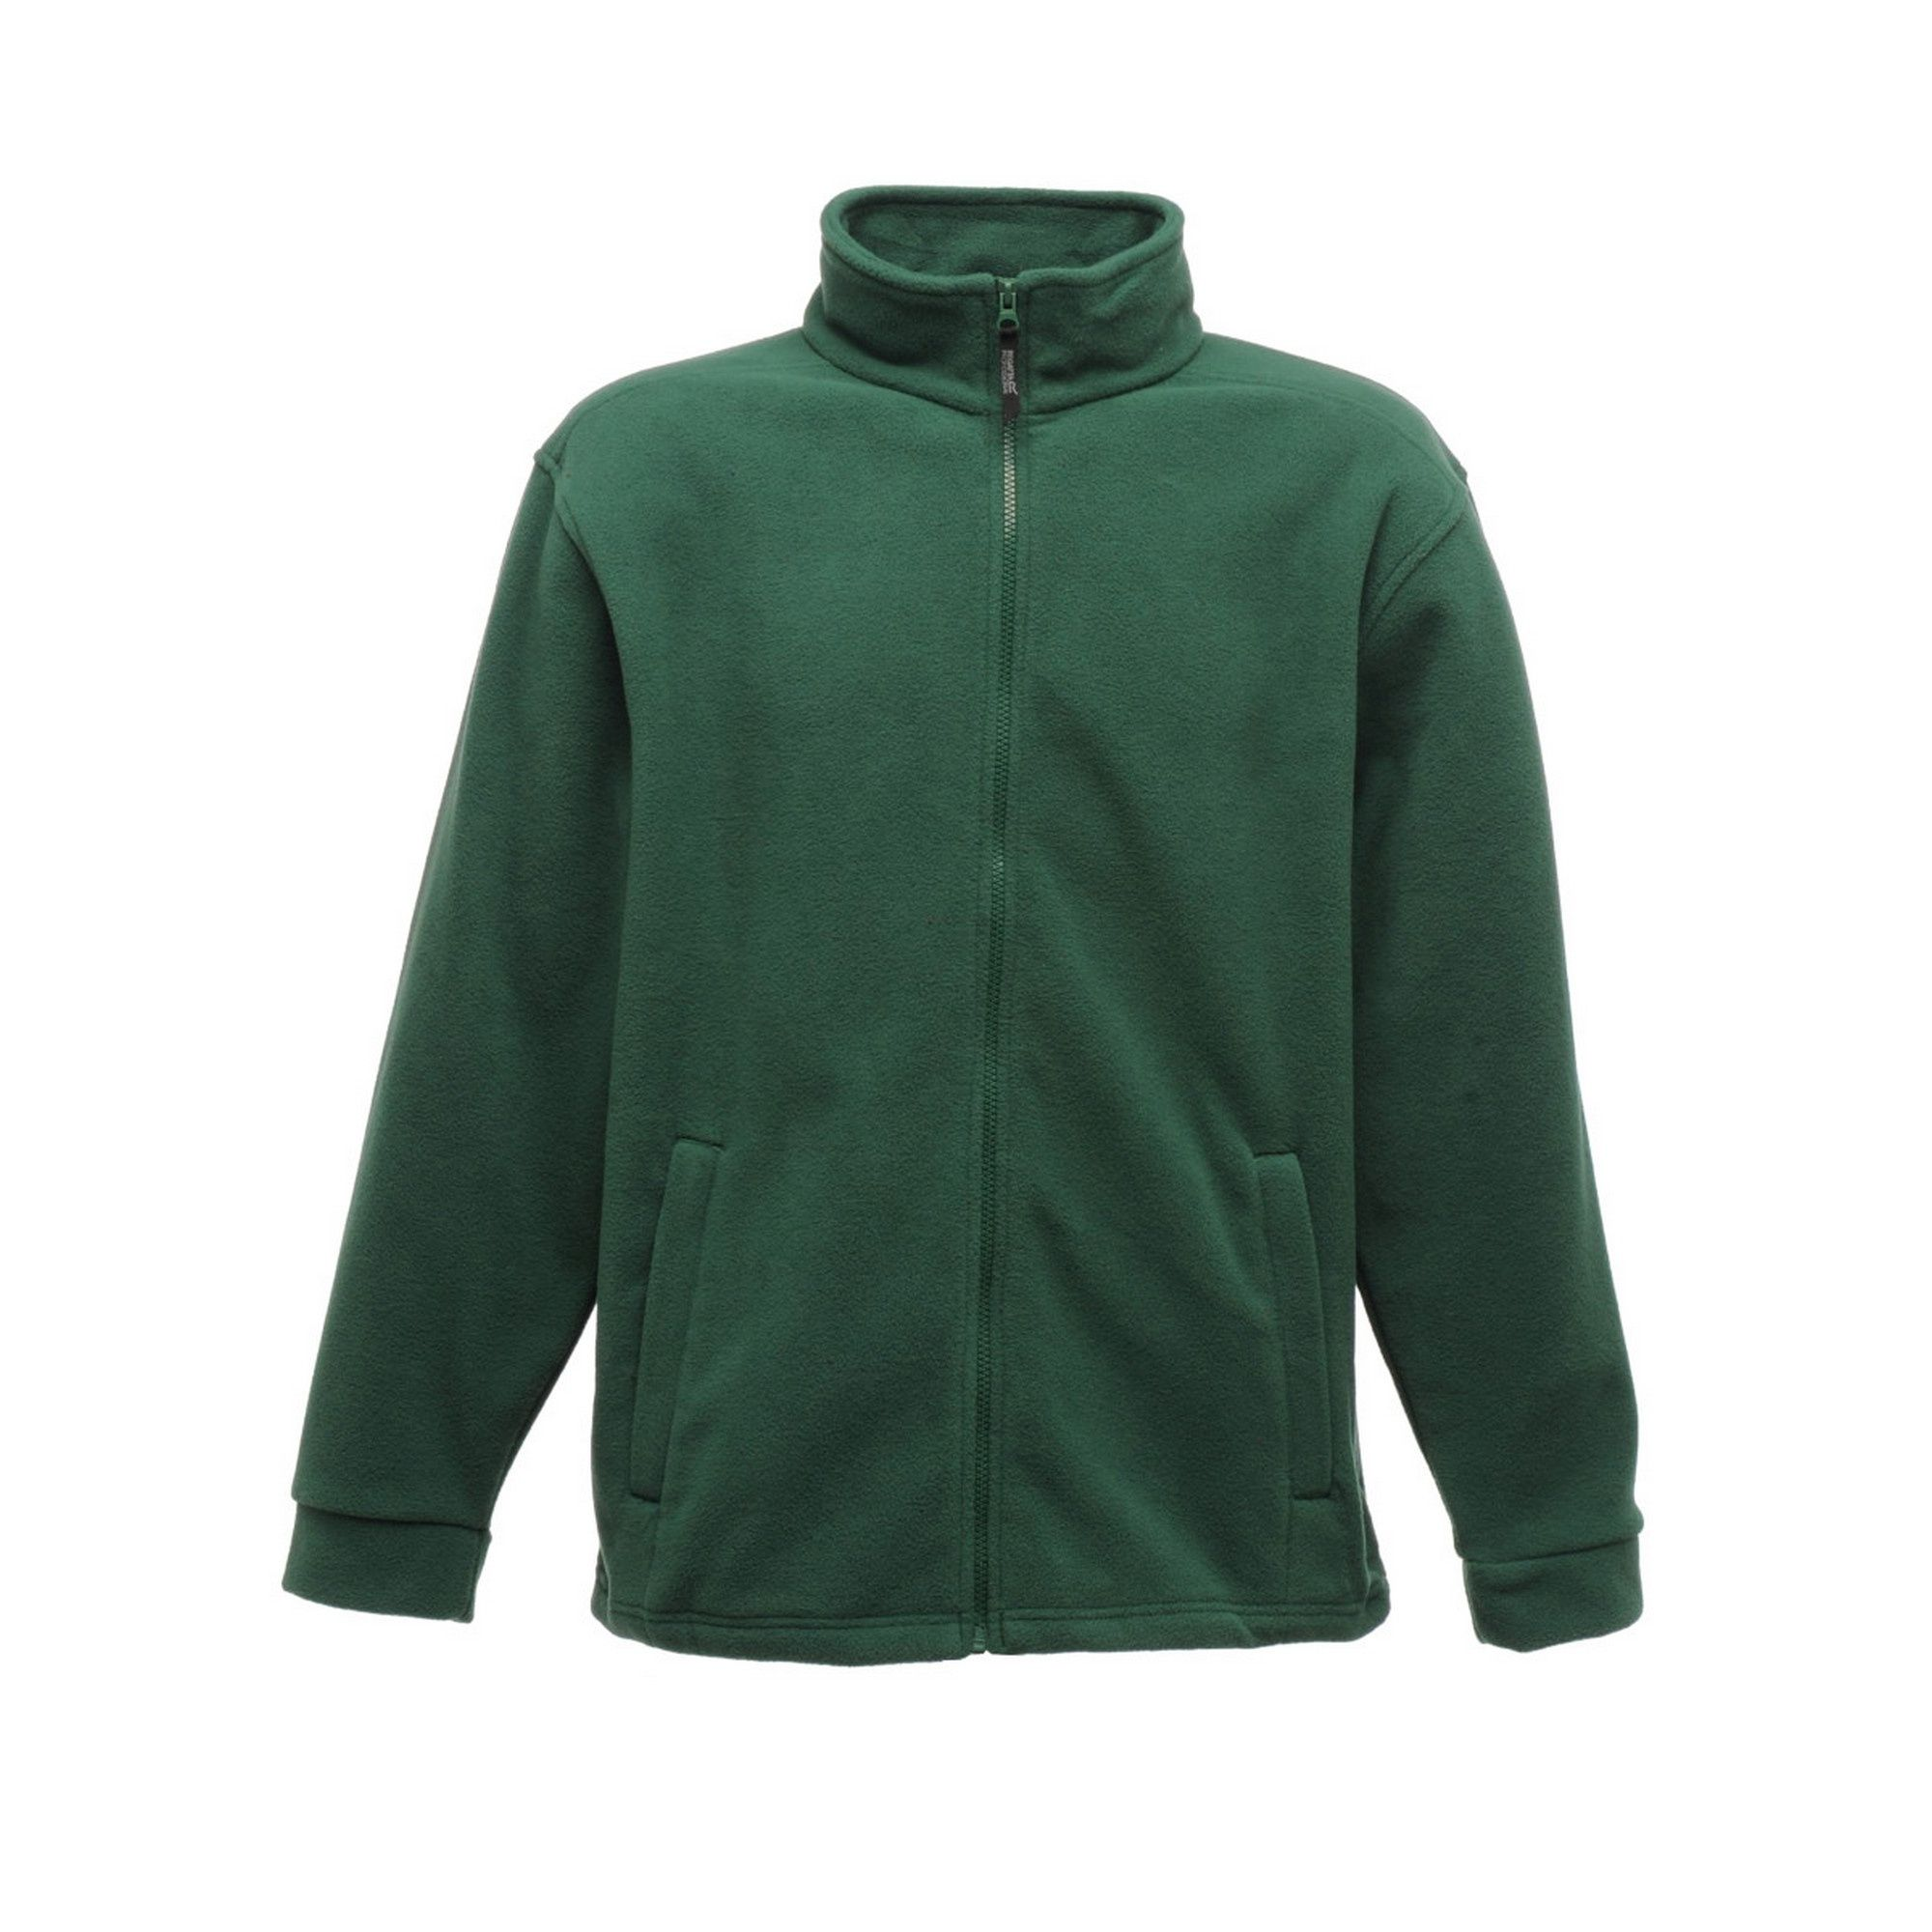 Regatta Mens Thor 300 Full Zip Fleece Jacket